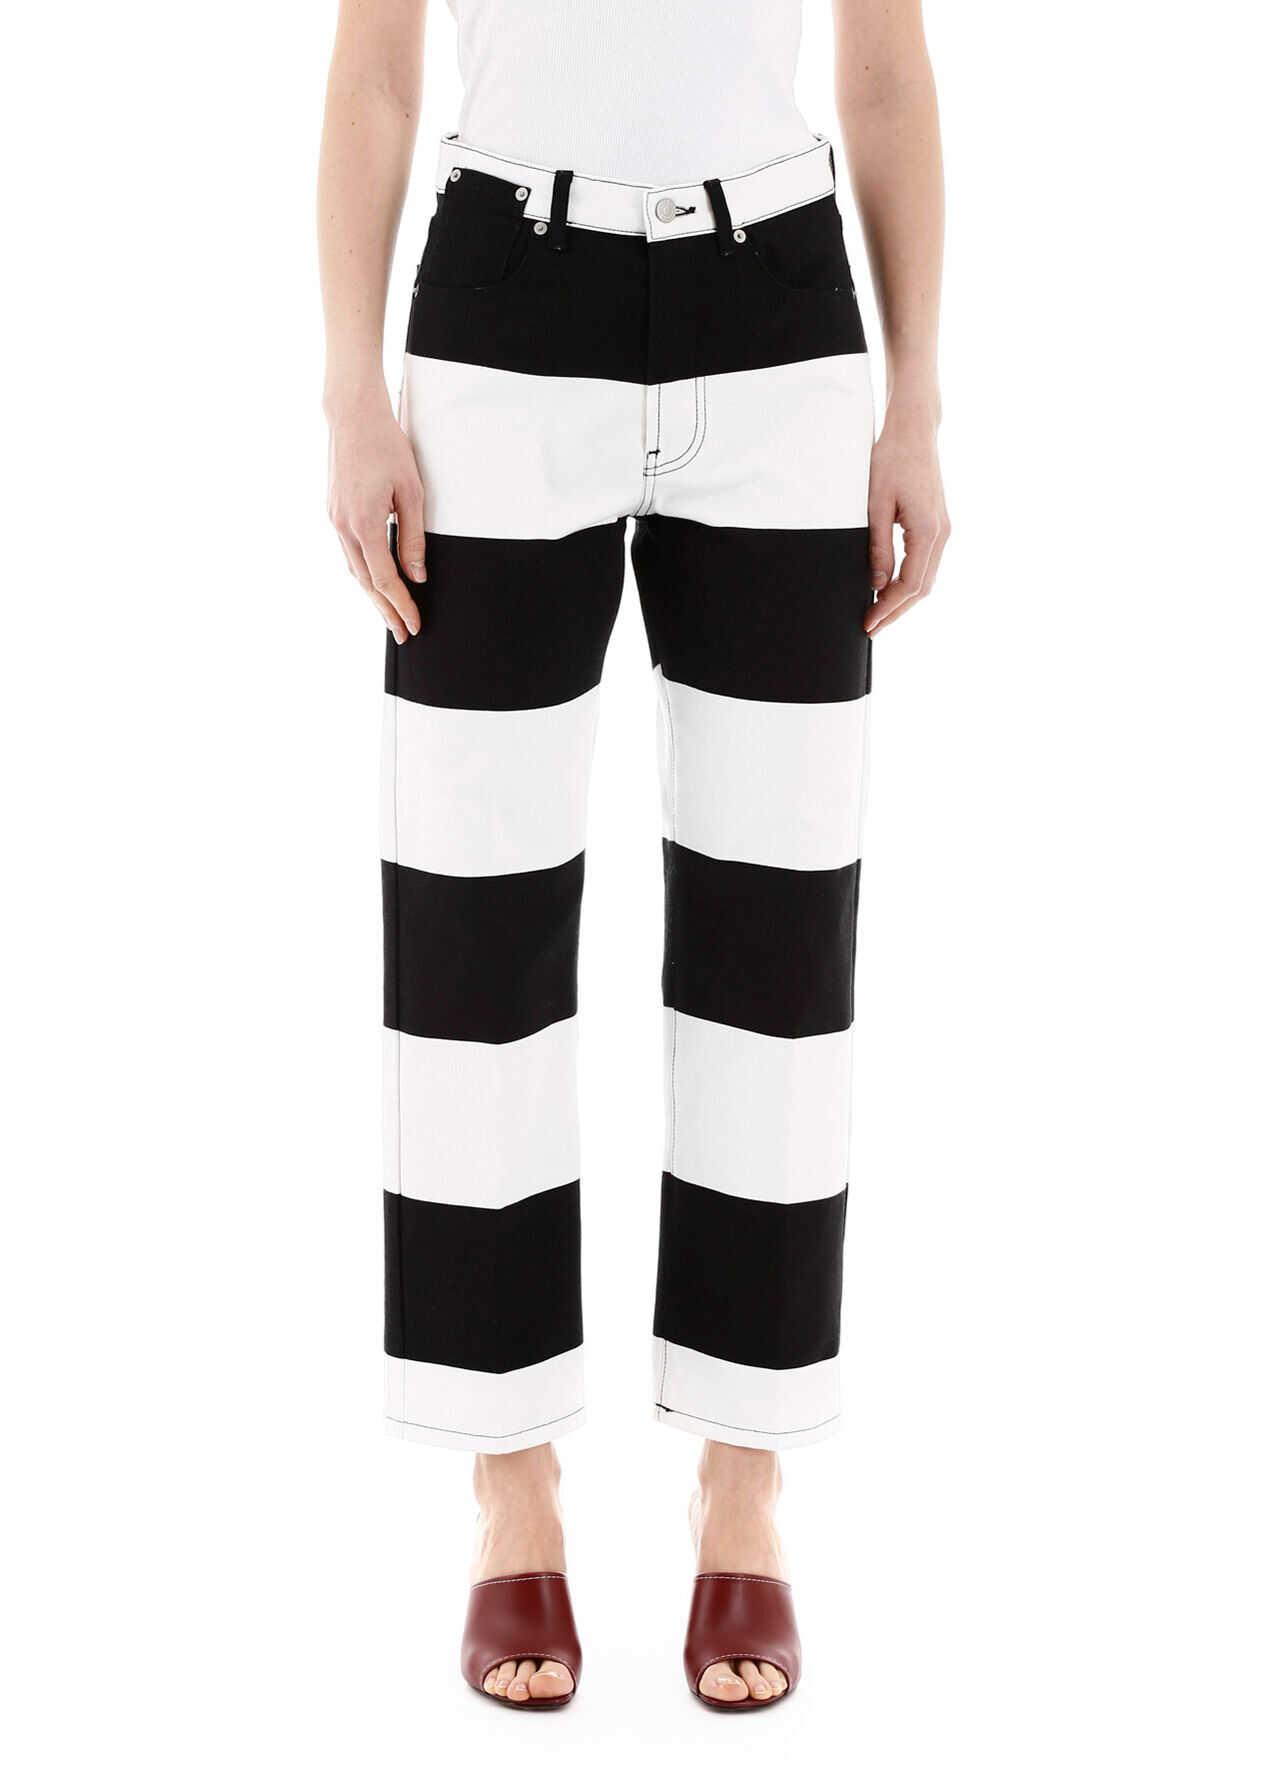 Dries Van Noten Two-Tone Jeans Maxi Stripes BLACK